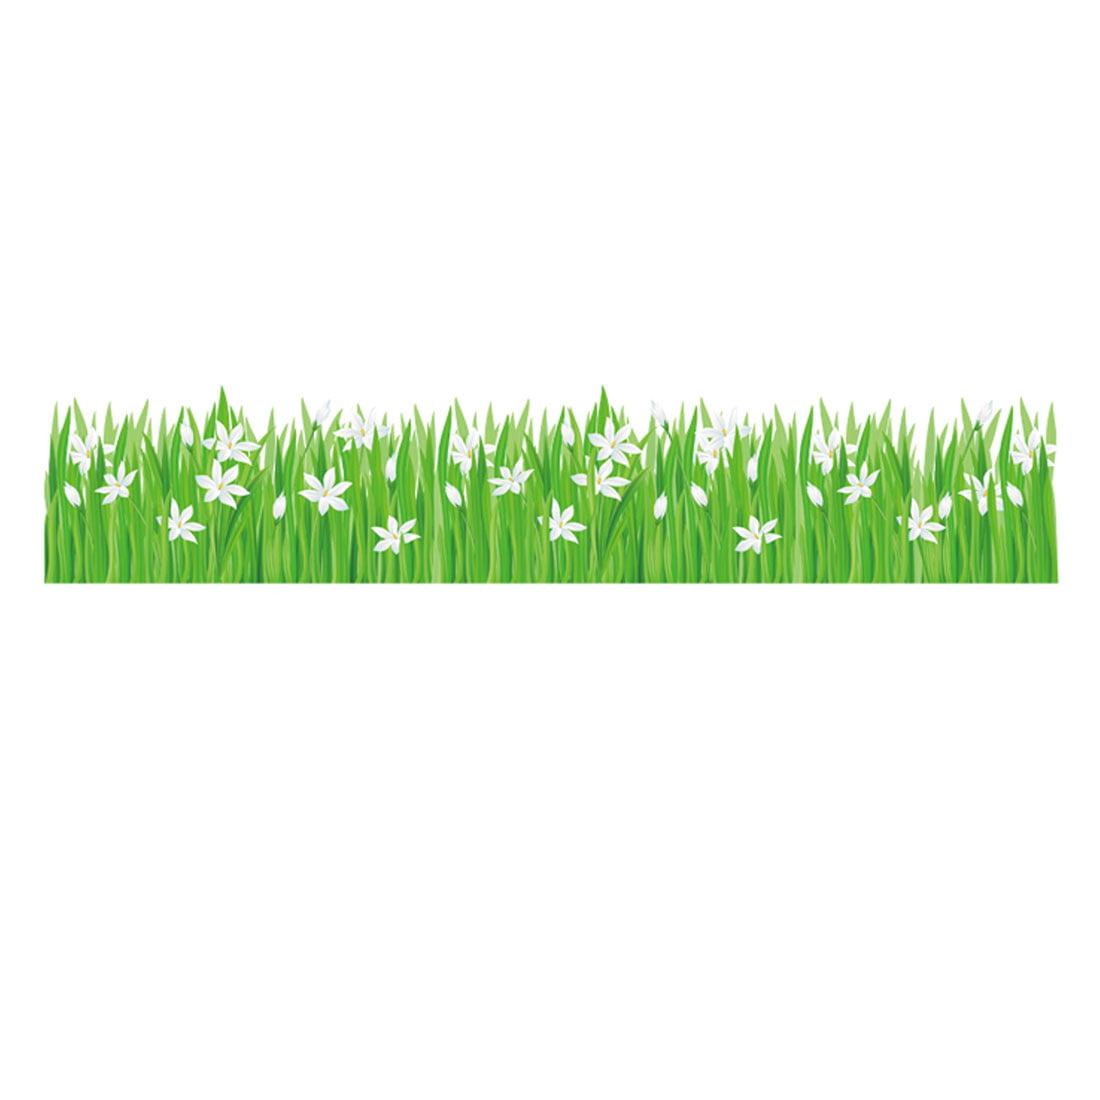 Home PVC Grass Flower Prints DIY Ornament Wall Sticker Decal Mural 50 x 70cm